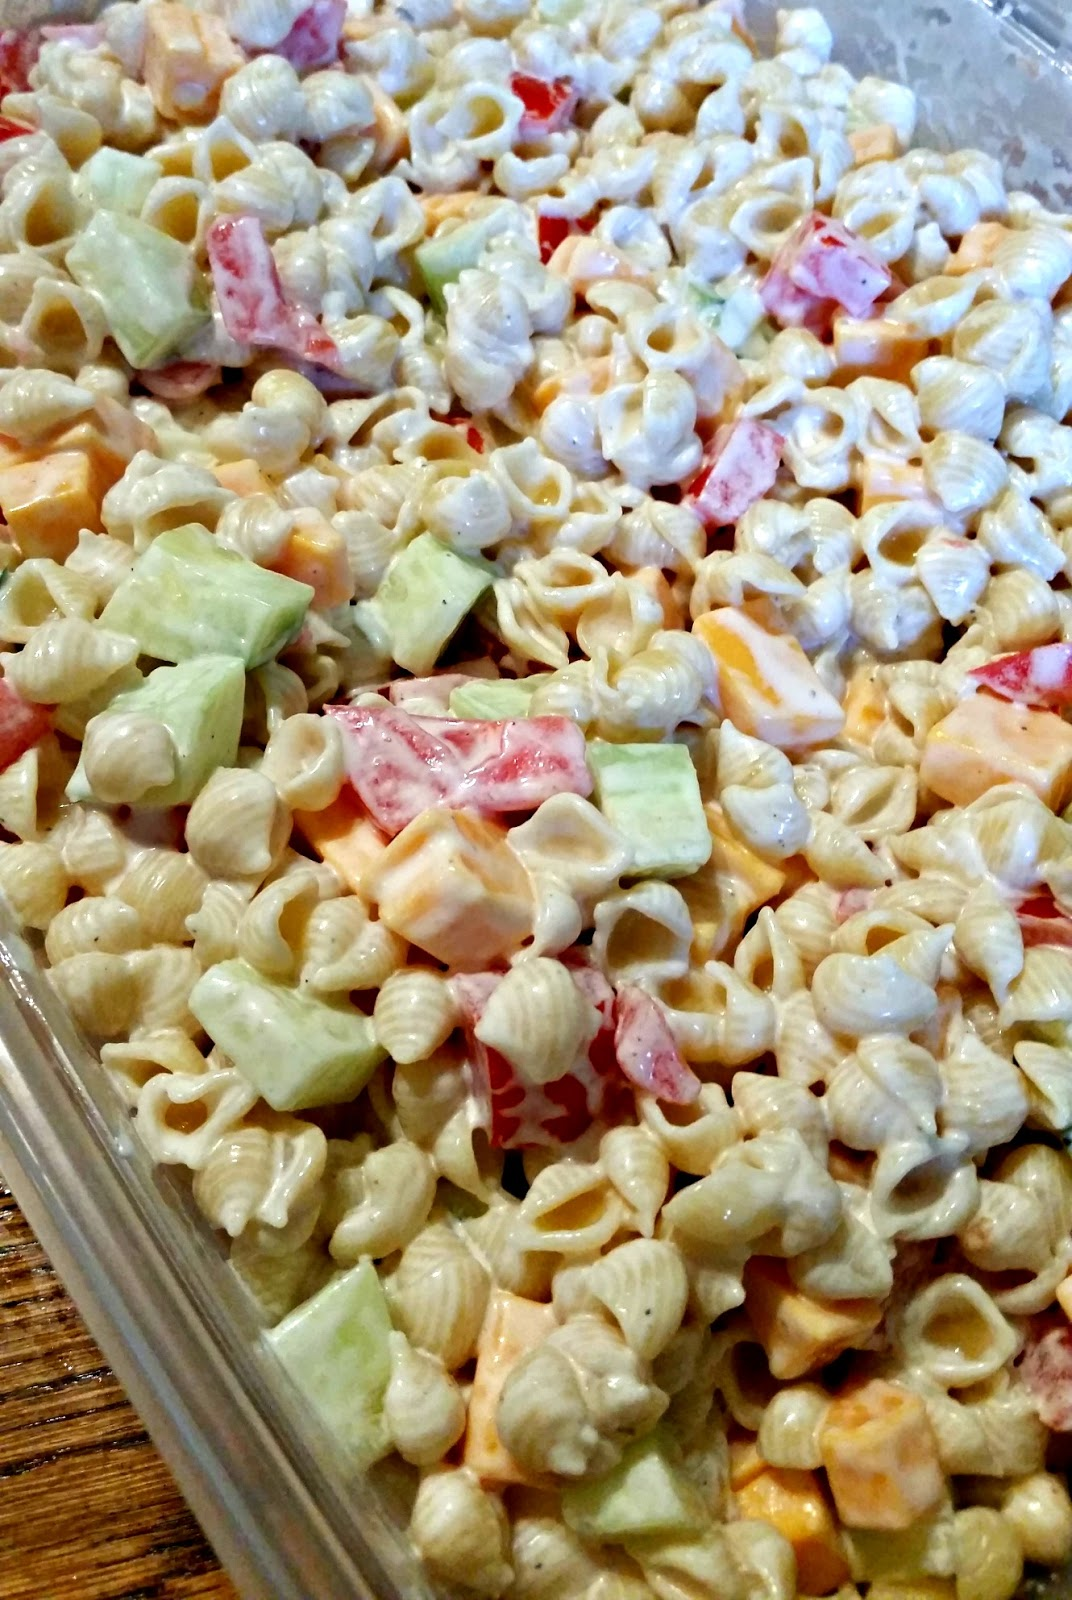 FoodThoughtsOfaChefWannabe: My mom's Macaroni Salad.....kinda